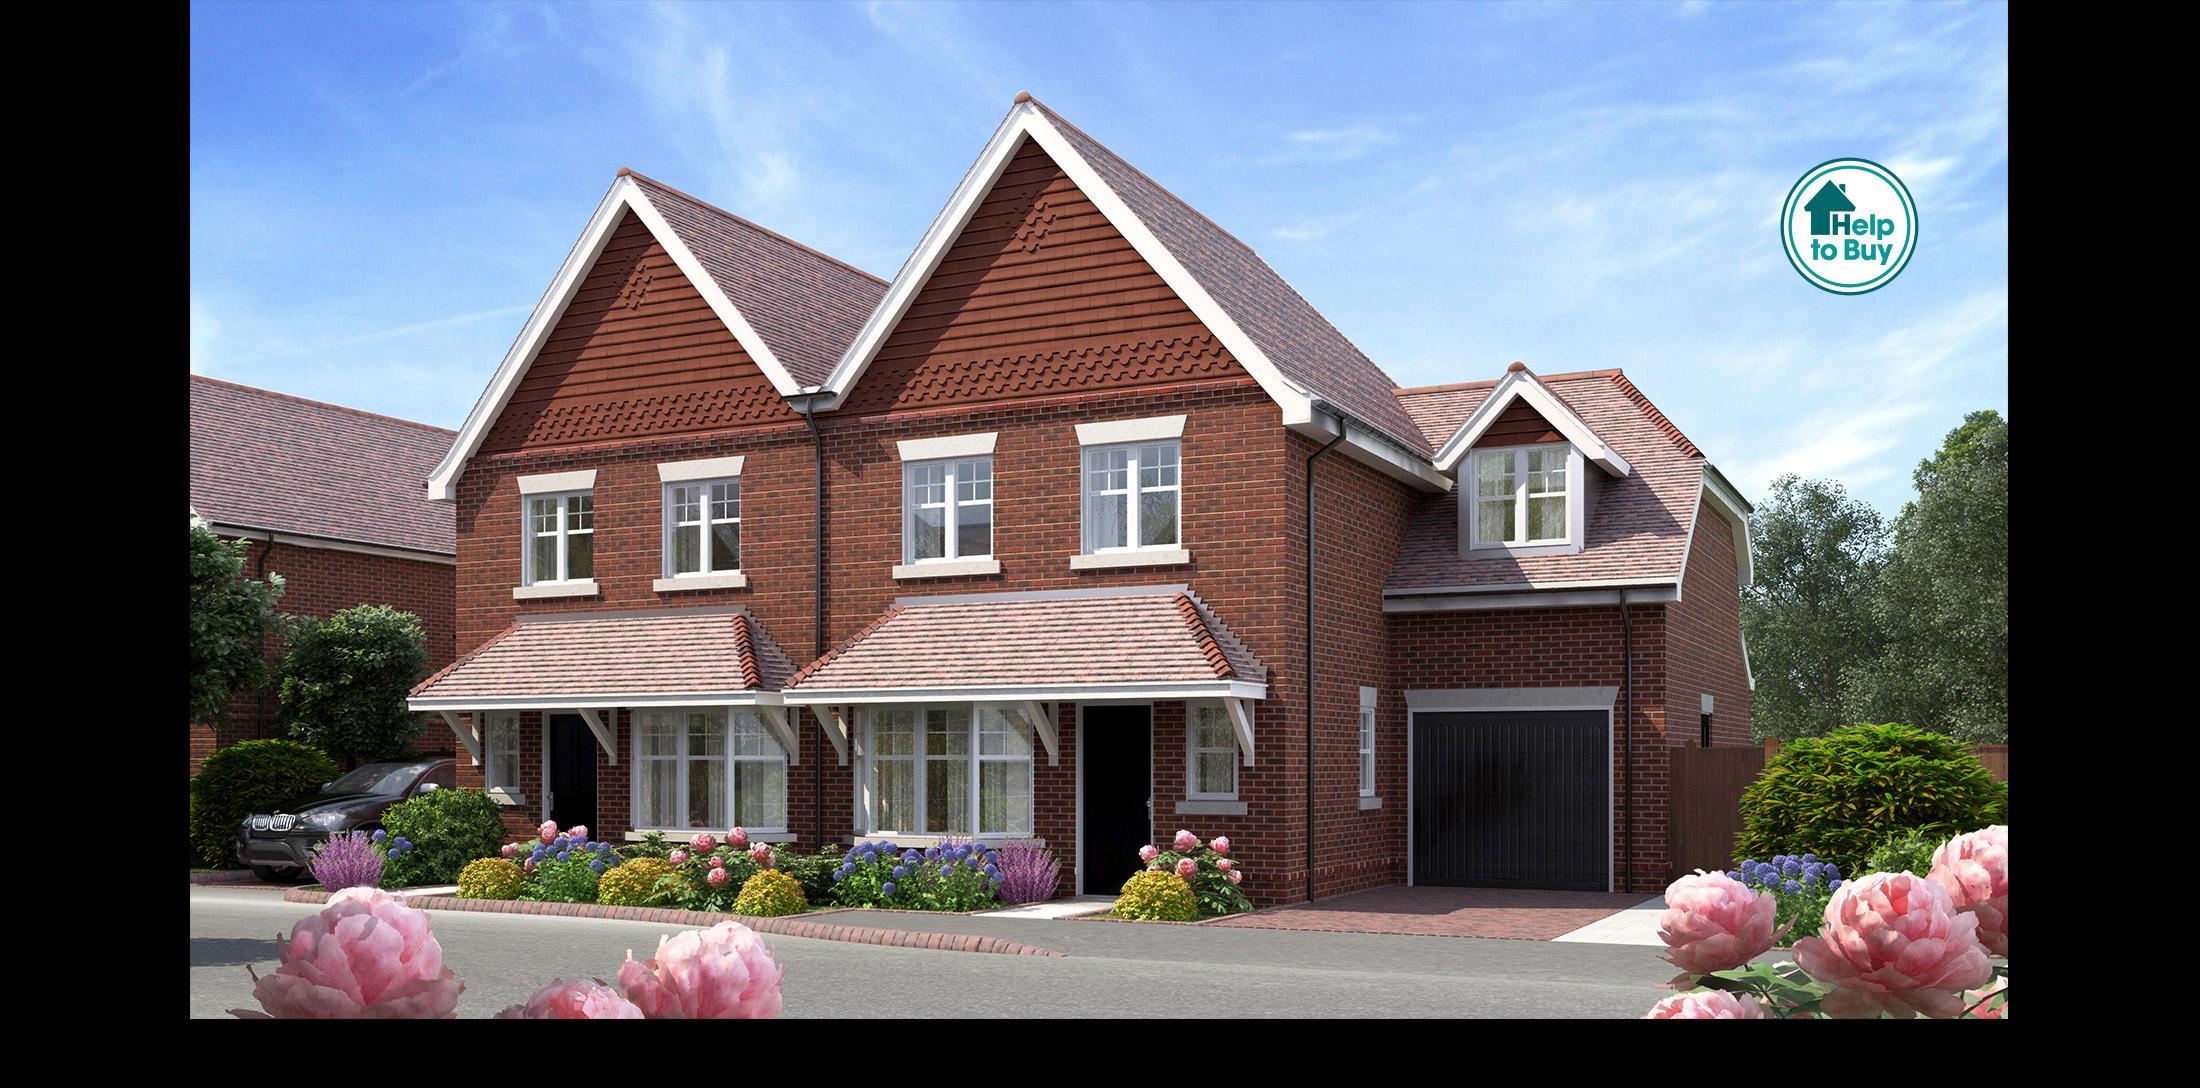 concept-developments-alder-grove-new-homes-chilworth-surrey-cgi-2-htb